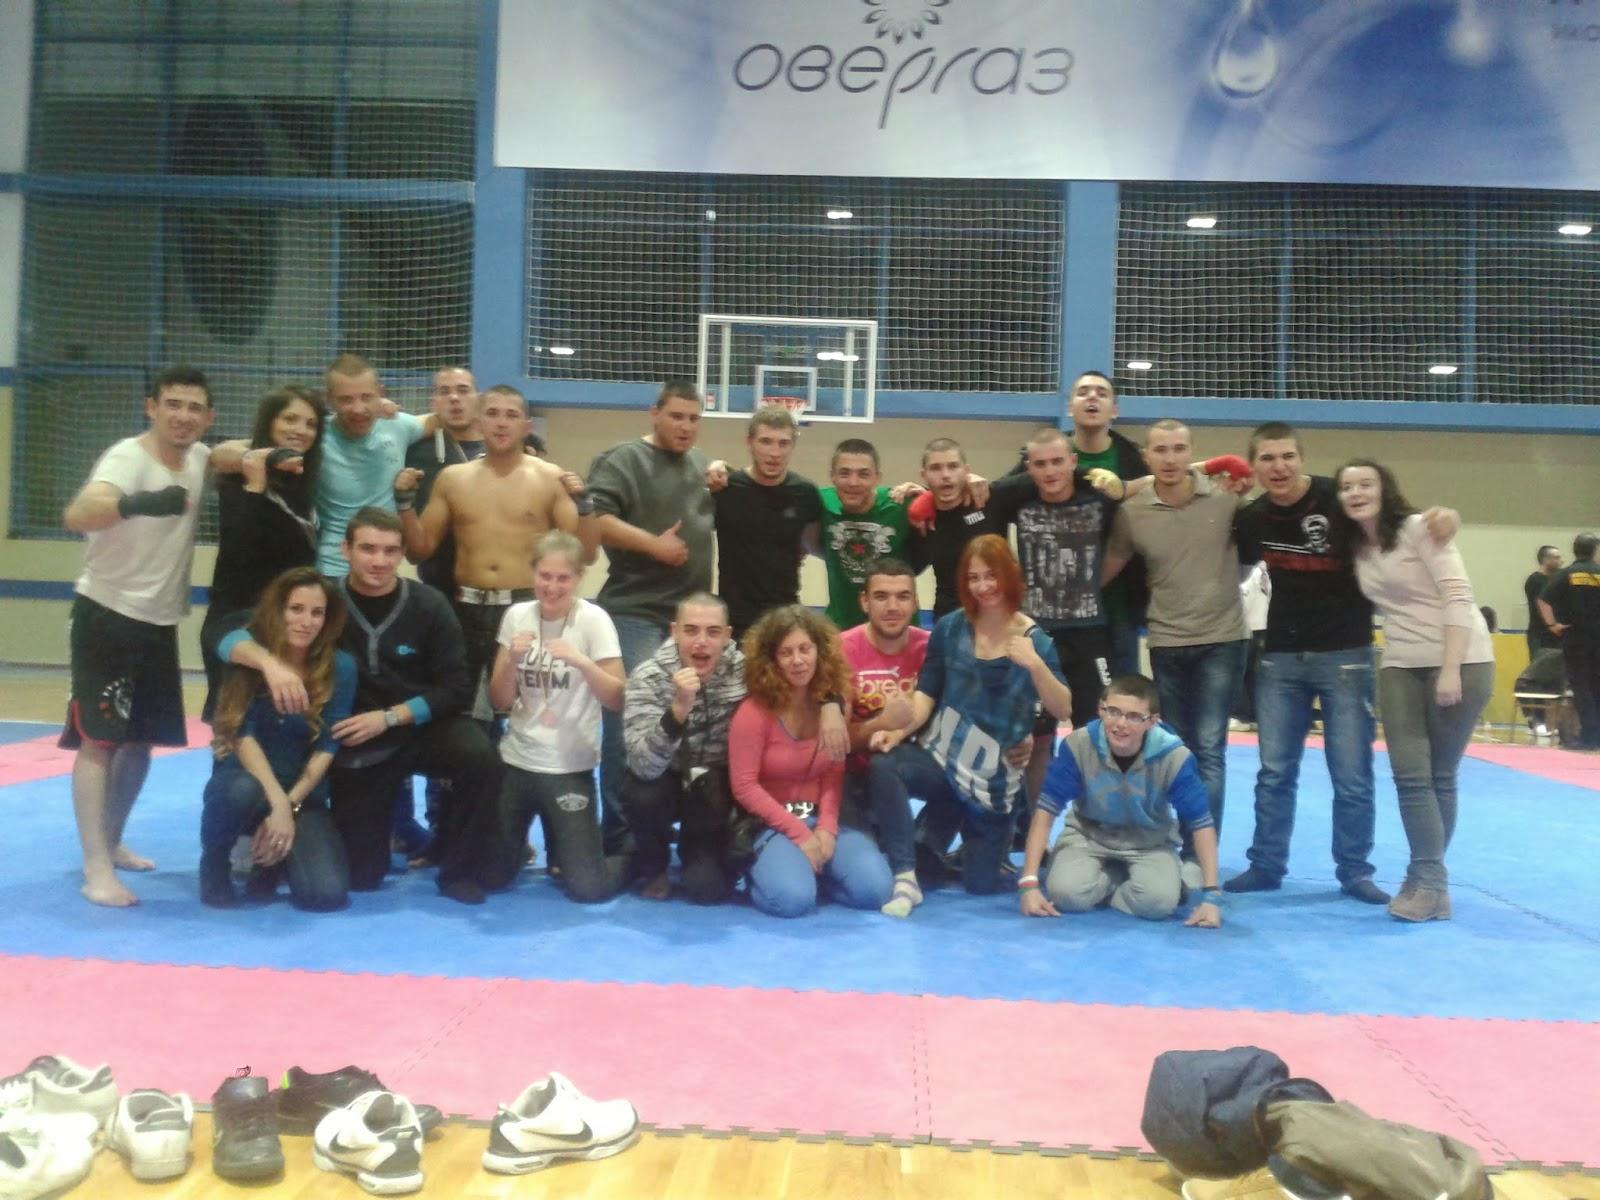 08bfe63c2e6 Bully Team побеждава с подкрепата на: - Красиви Тела - Sandex Sport - Tribe  fightwear - MMA Bulgaria